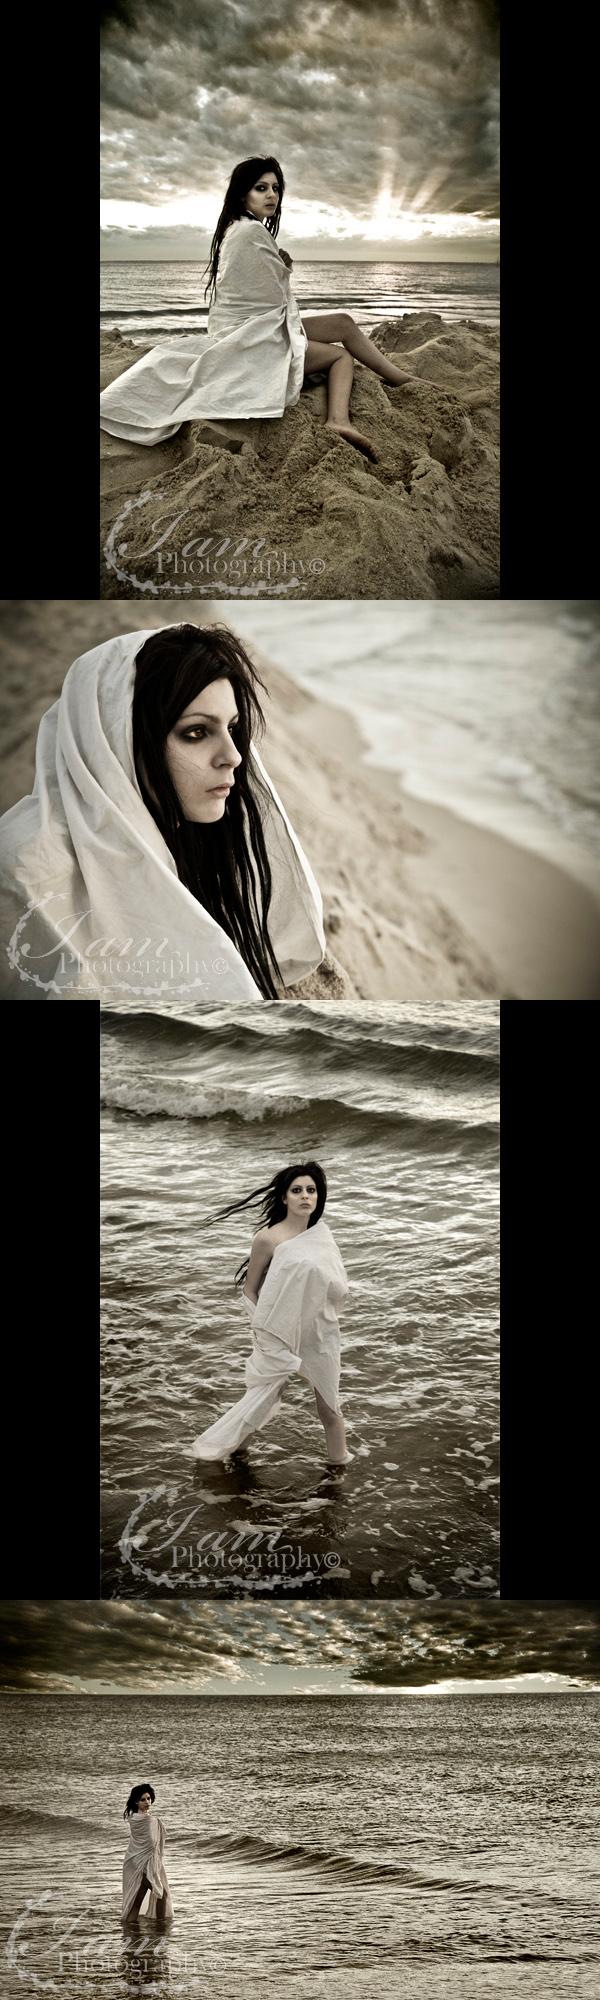 Female model photo shoot of Stacey-Rae Jones by Harry Millward Photos in Brighton Beach Adelaide